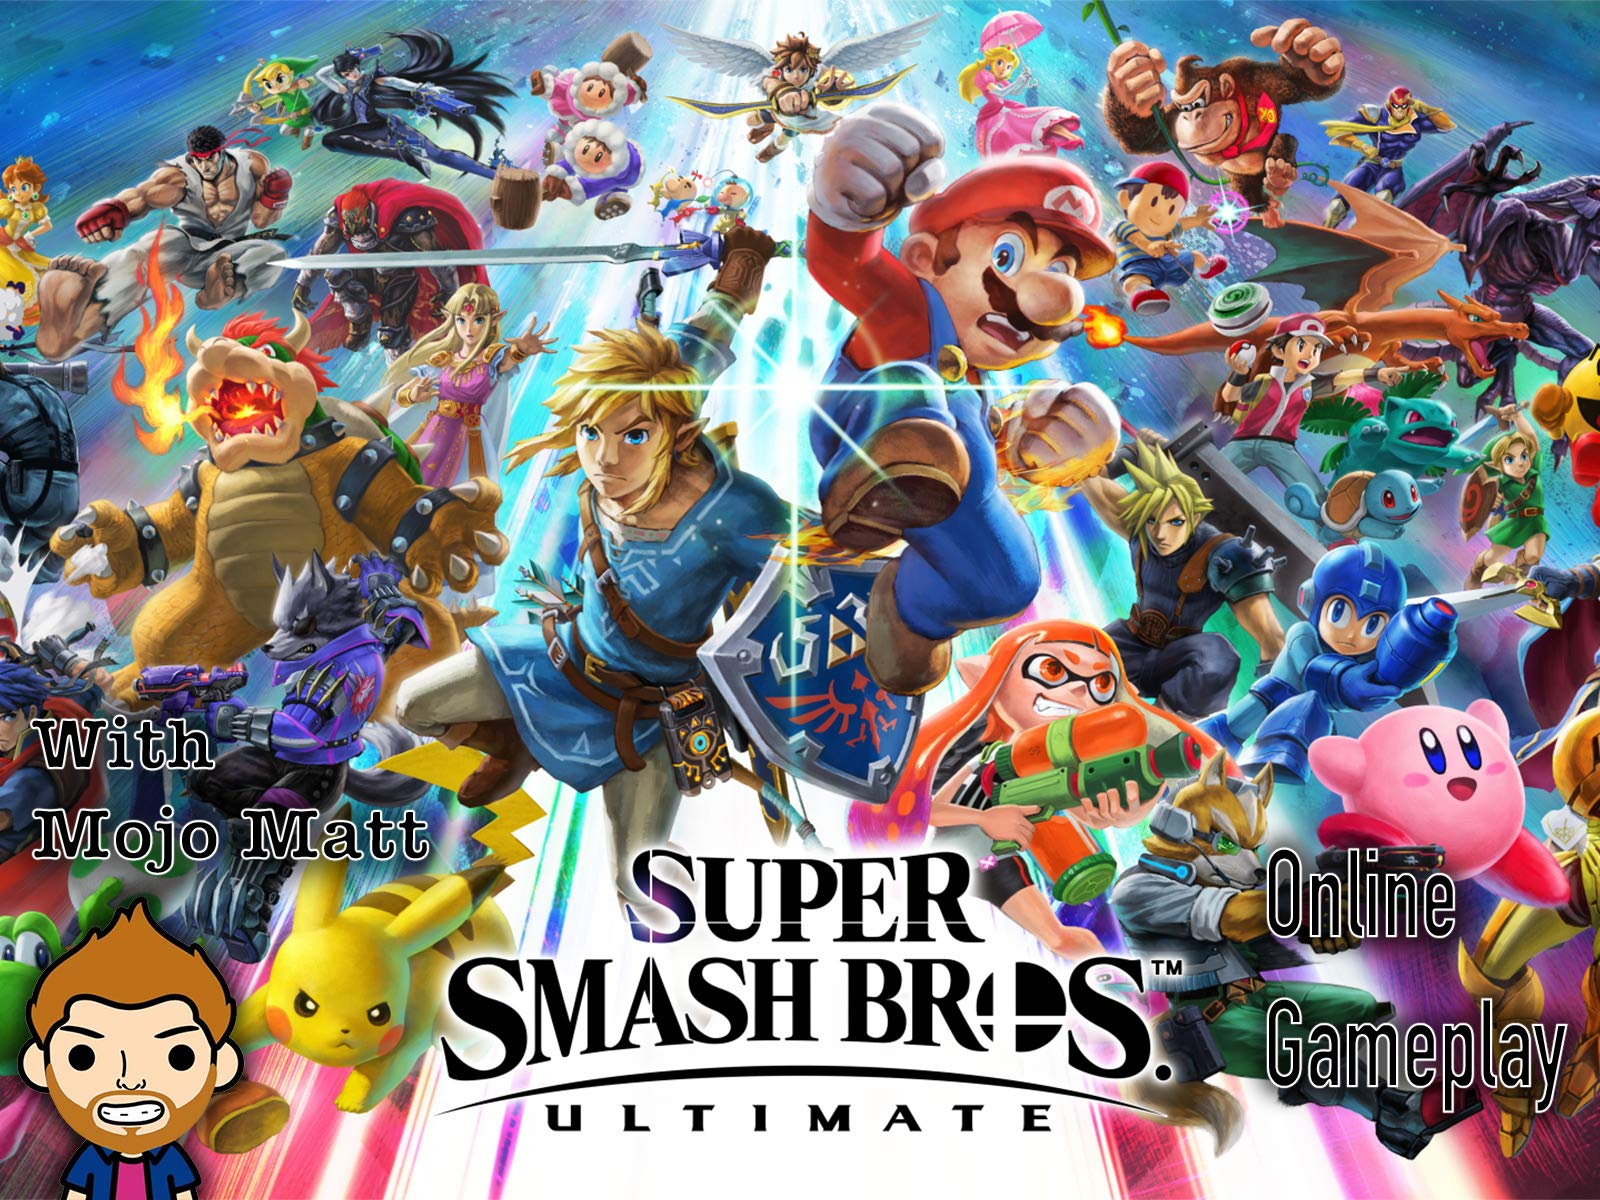 Super Smash Bros. Ultimate Online Gameplay With Mojo Matt on Amazon Prime Video UK